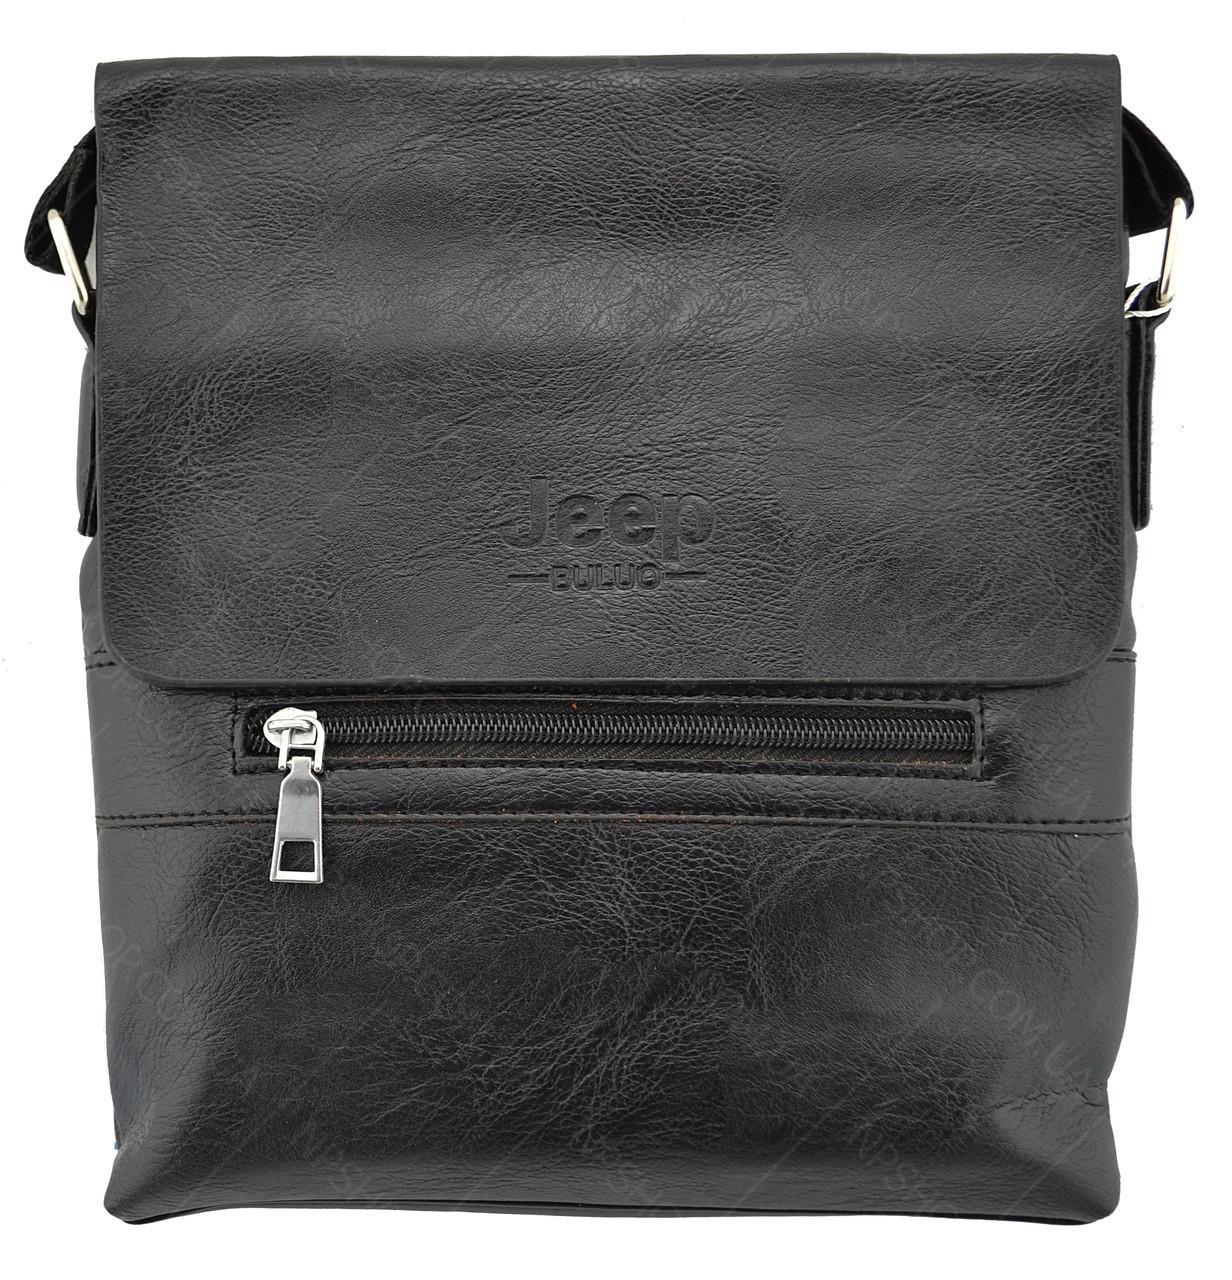 Мужская сумка через плечо JEEP 866 BAGS   Черная